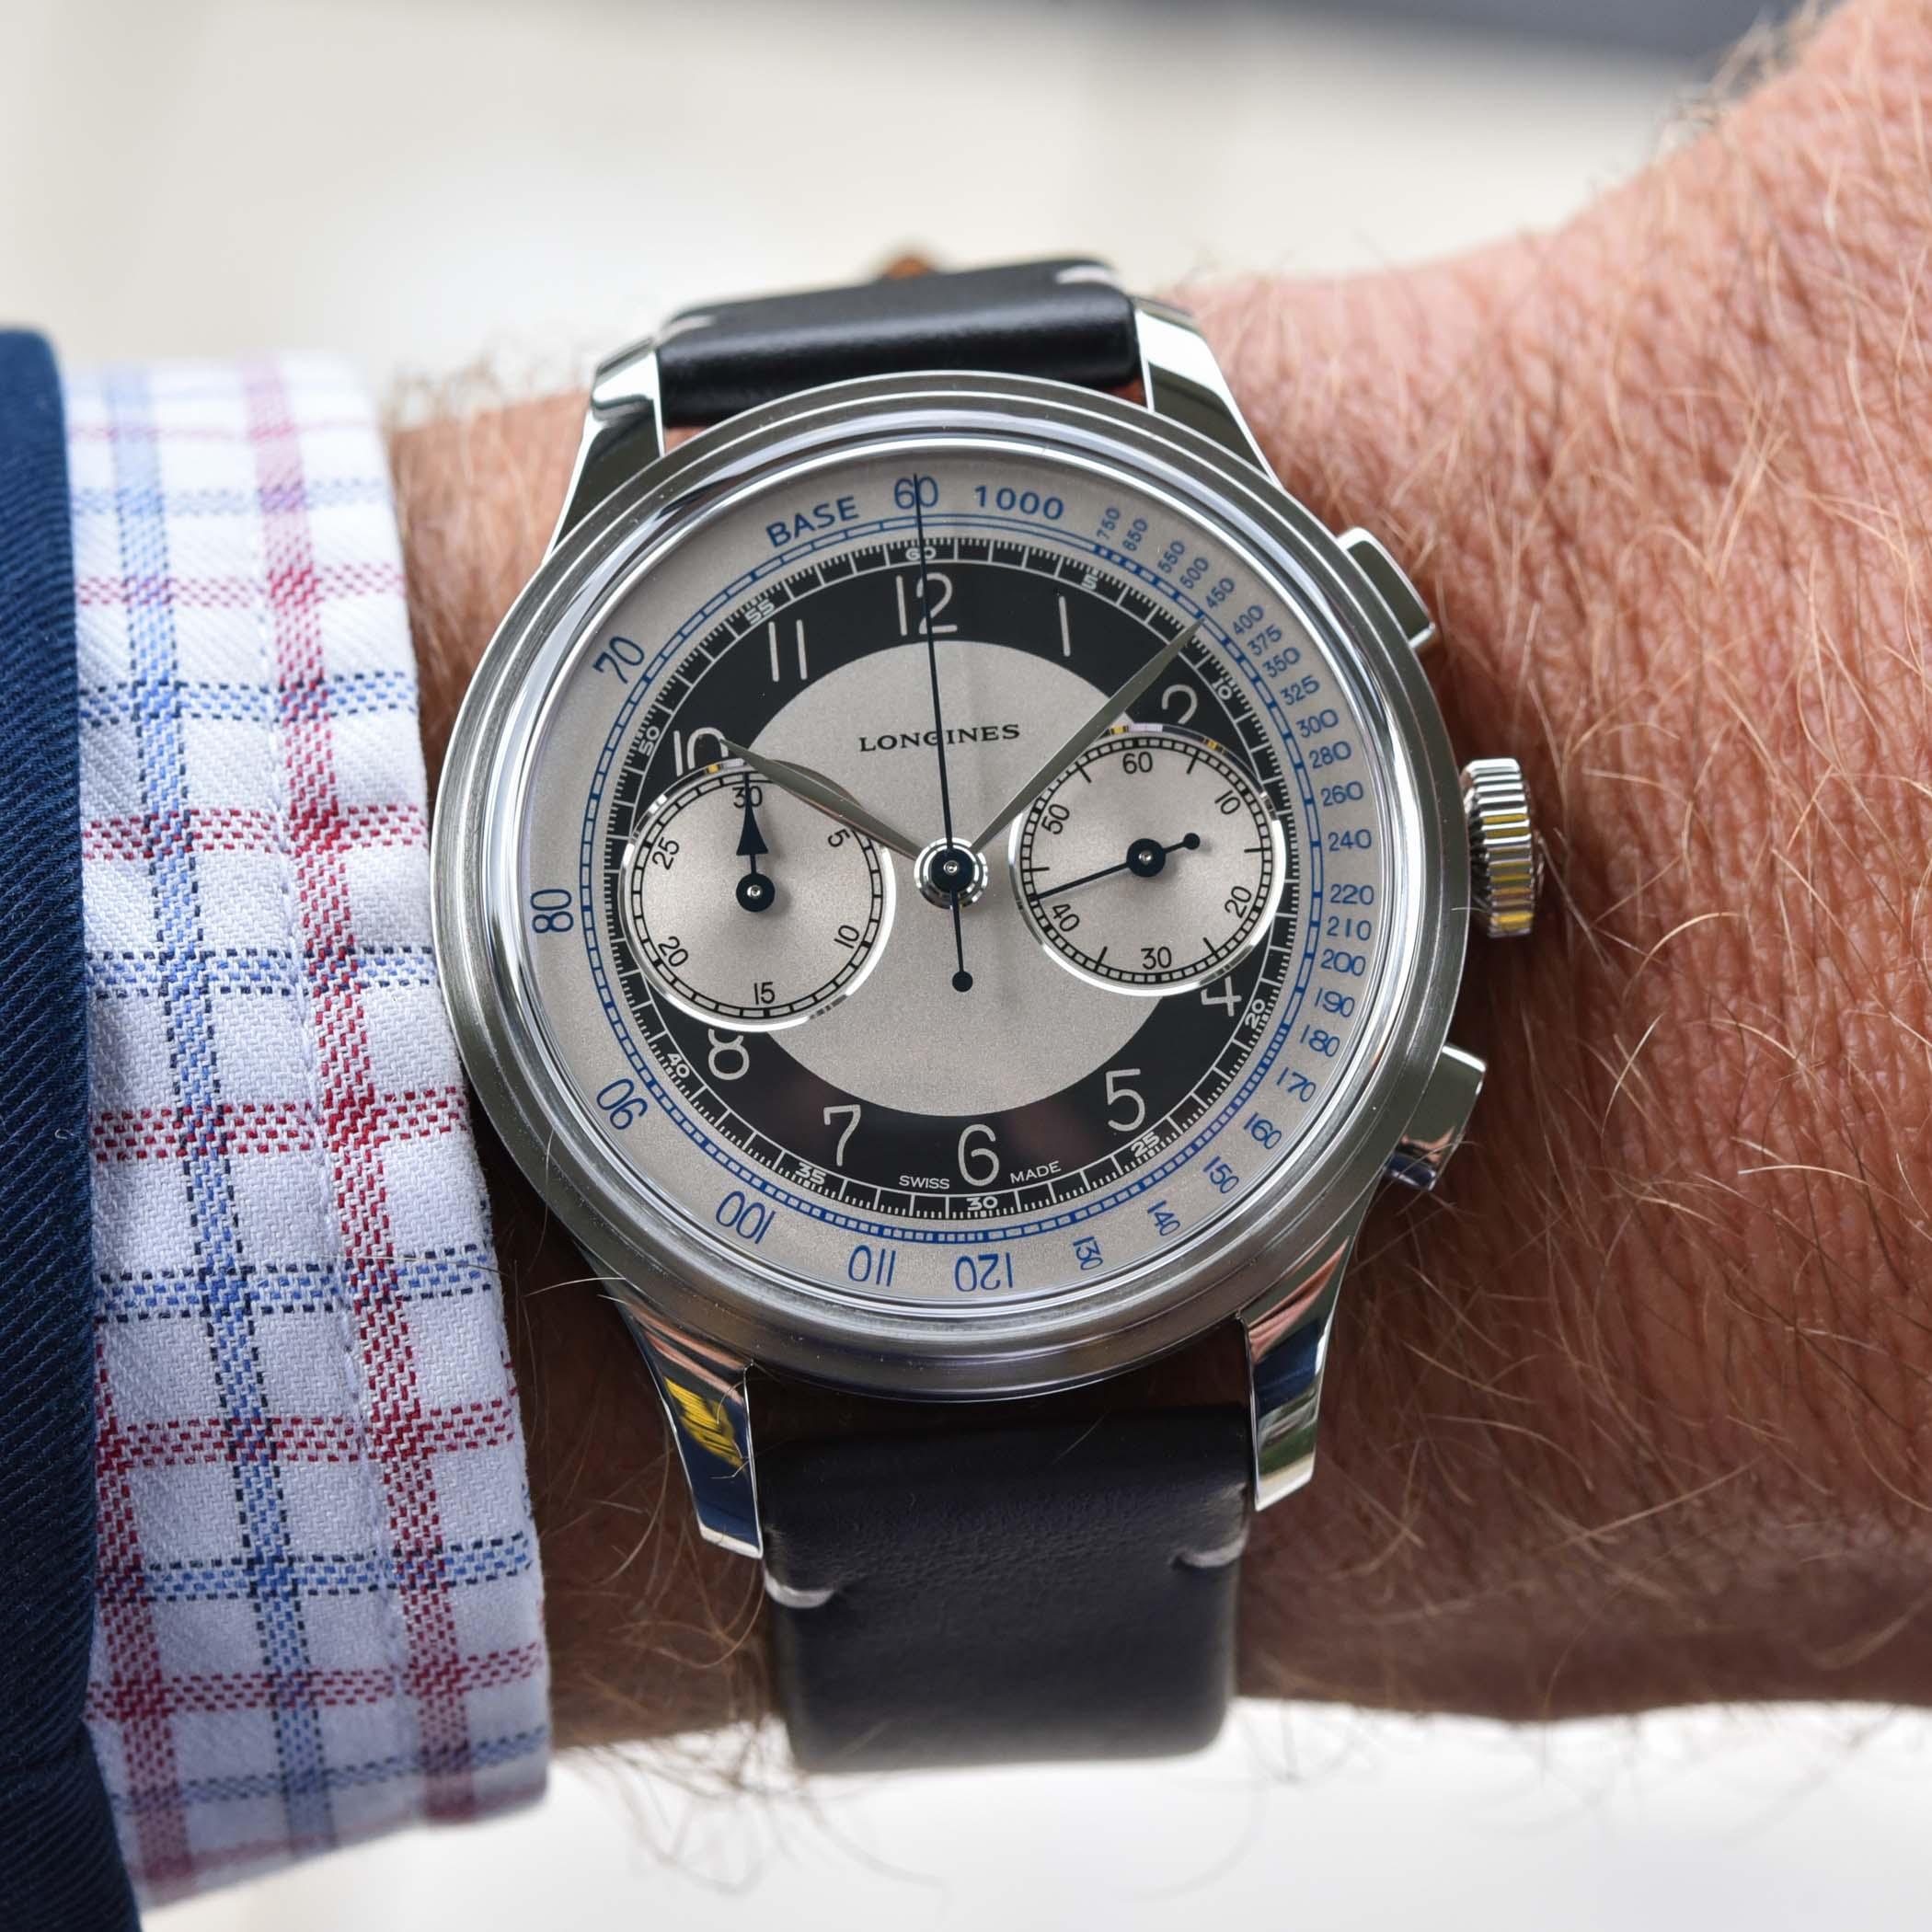 El Longines Heritage Classic Tuxedo Chronograph, en la muñeca